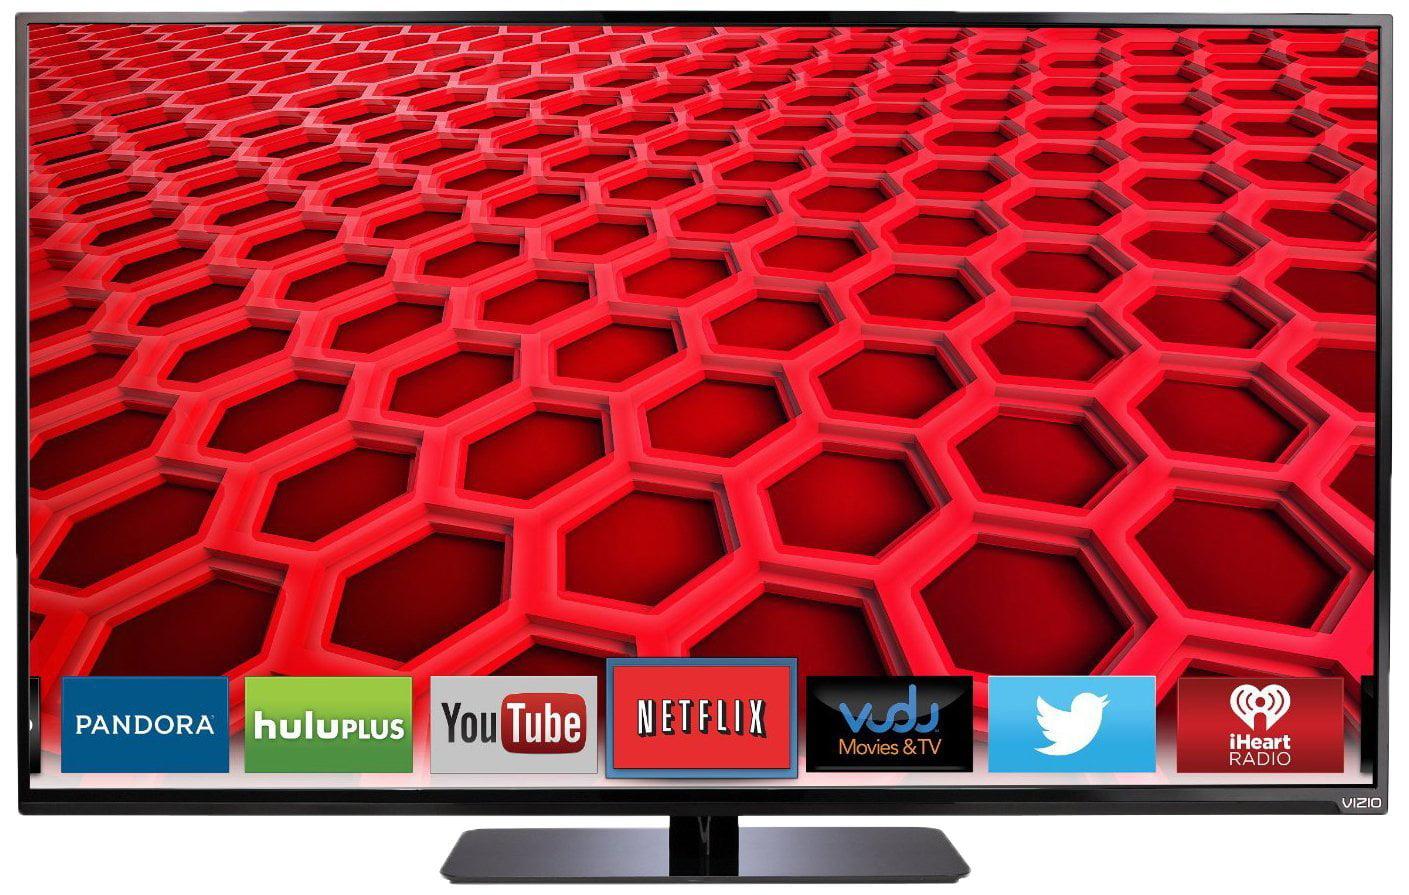 Televisores Led O Oled VIZIO renovado E500I-B1 50